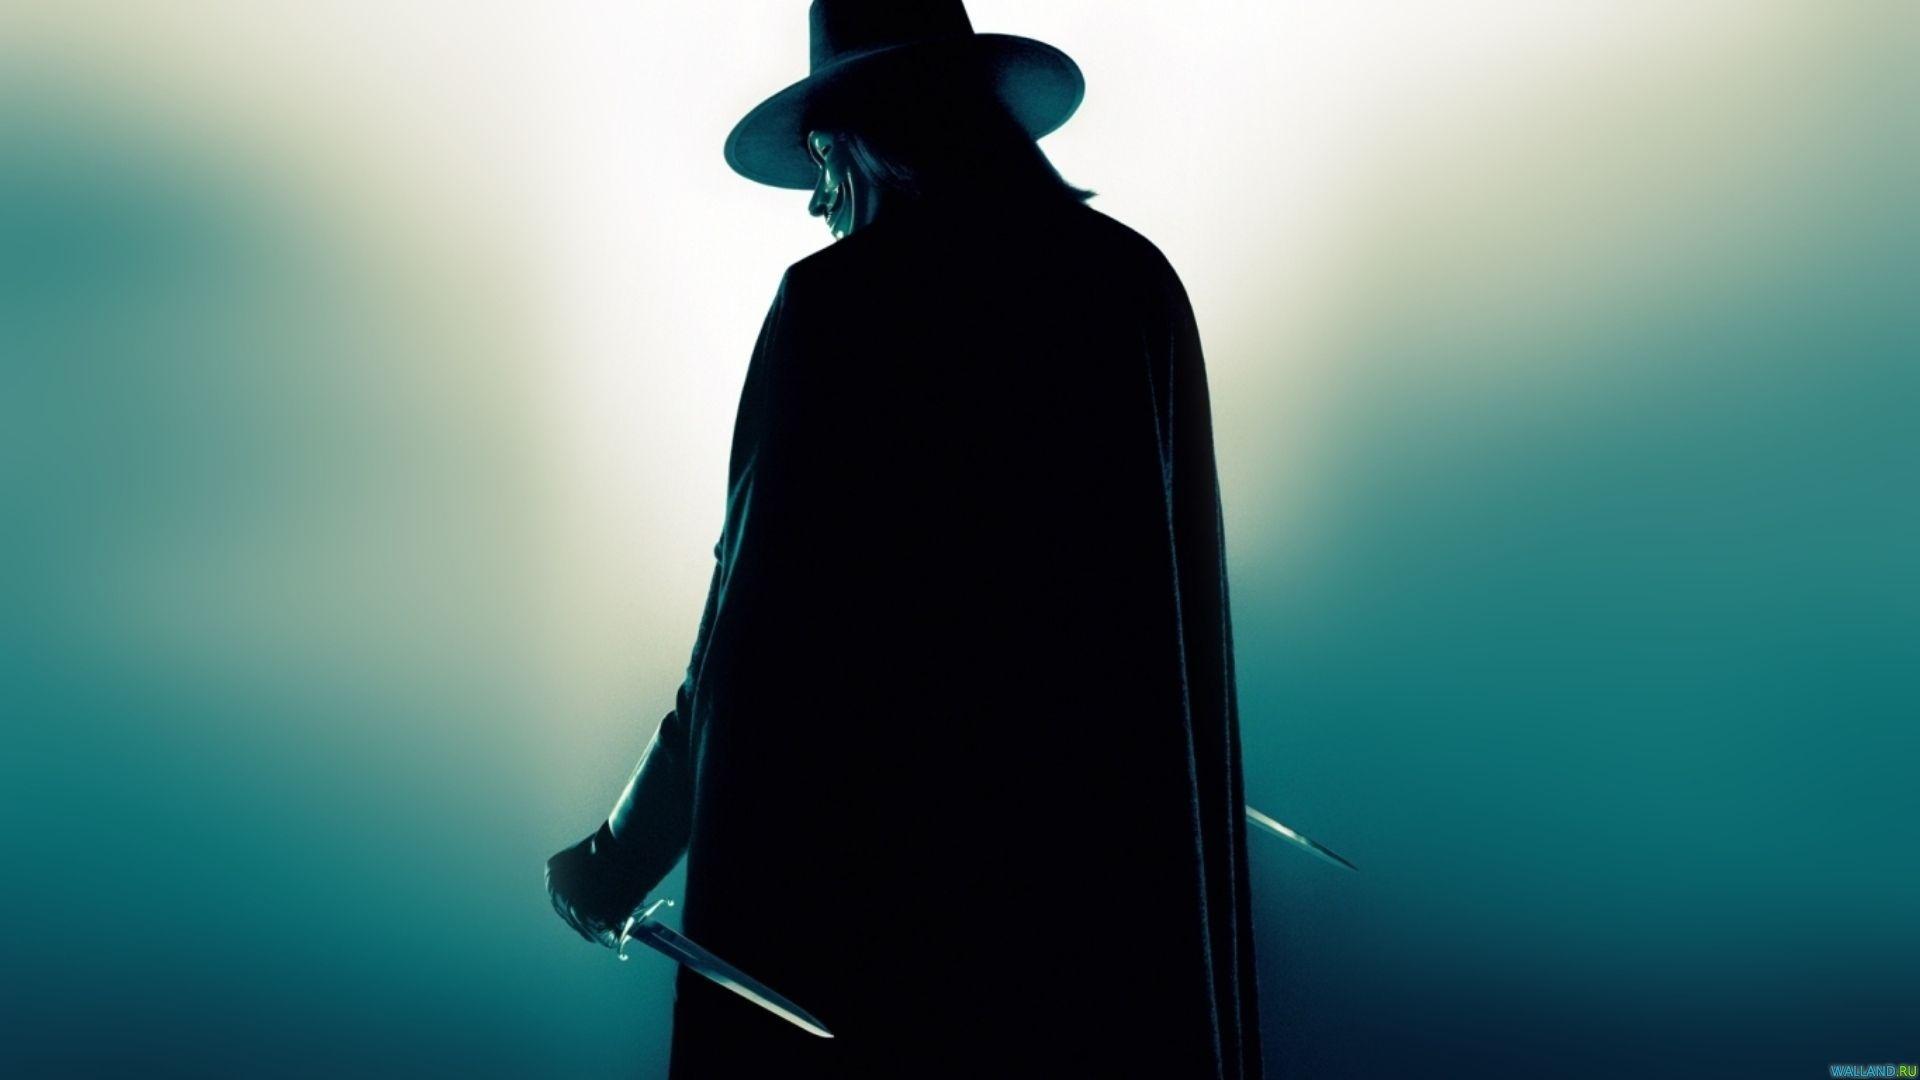 V For Vendetta Wallpaper Movie Desktop 1